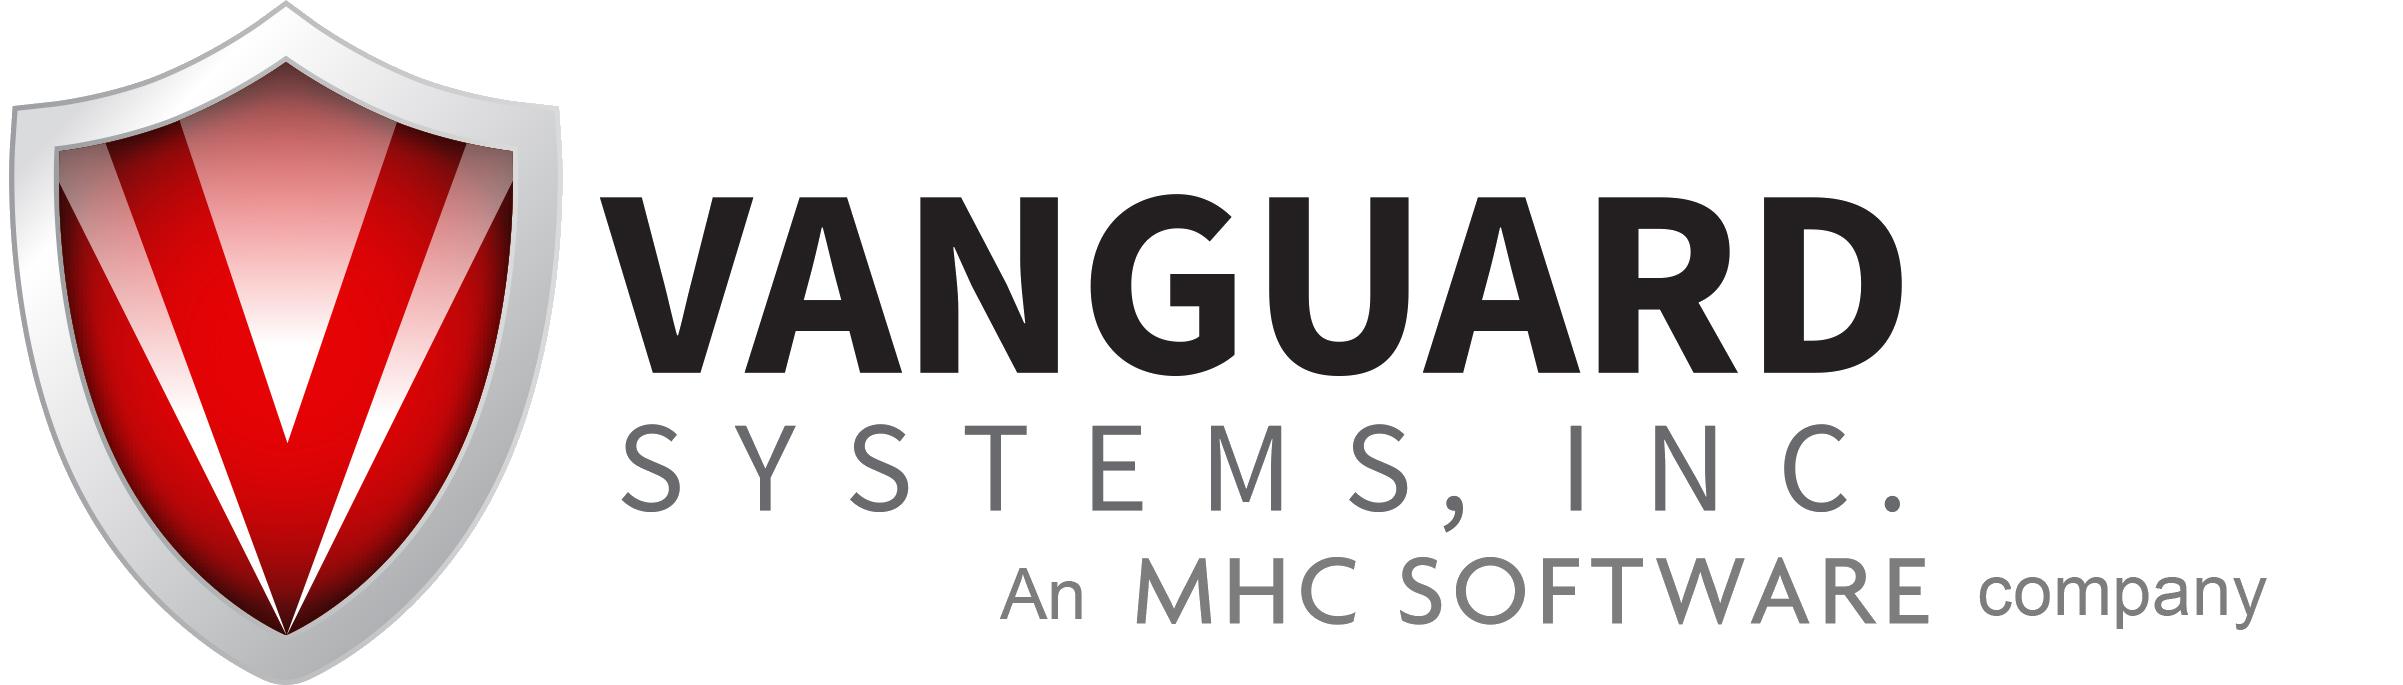 Vanguard System, INC.